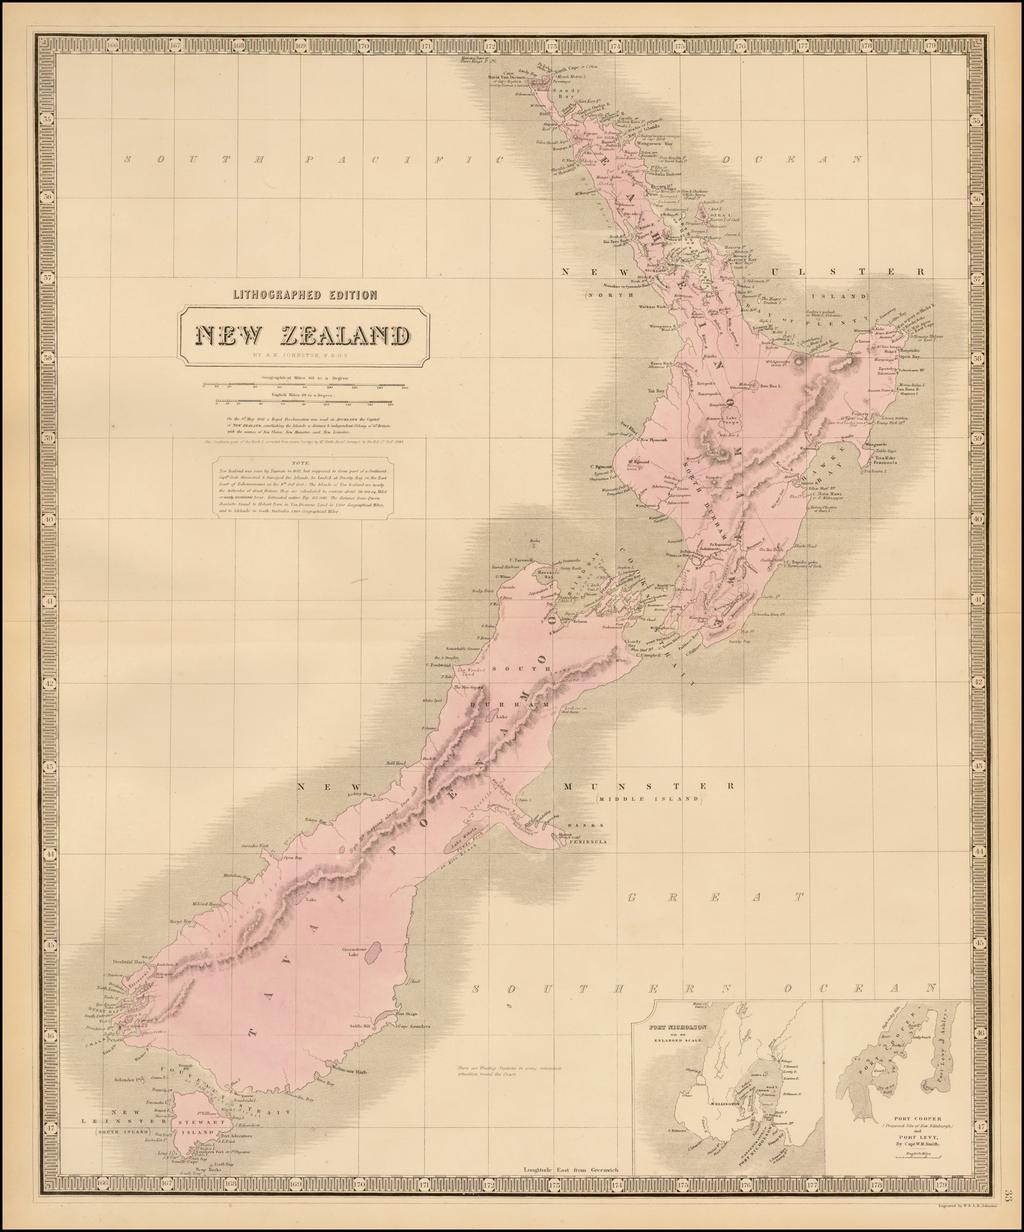 New Zealand By W. & A.K. Johnston